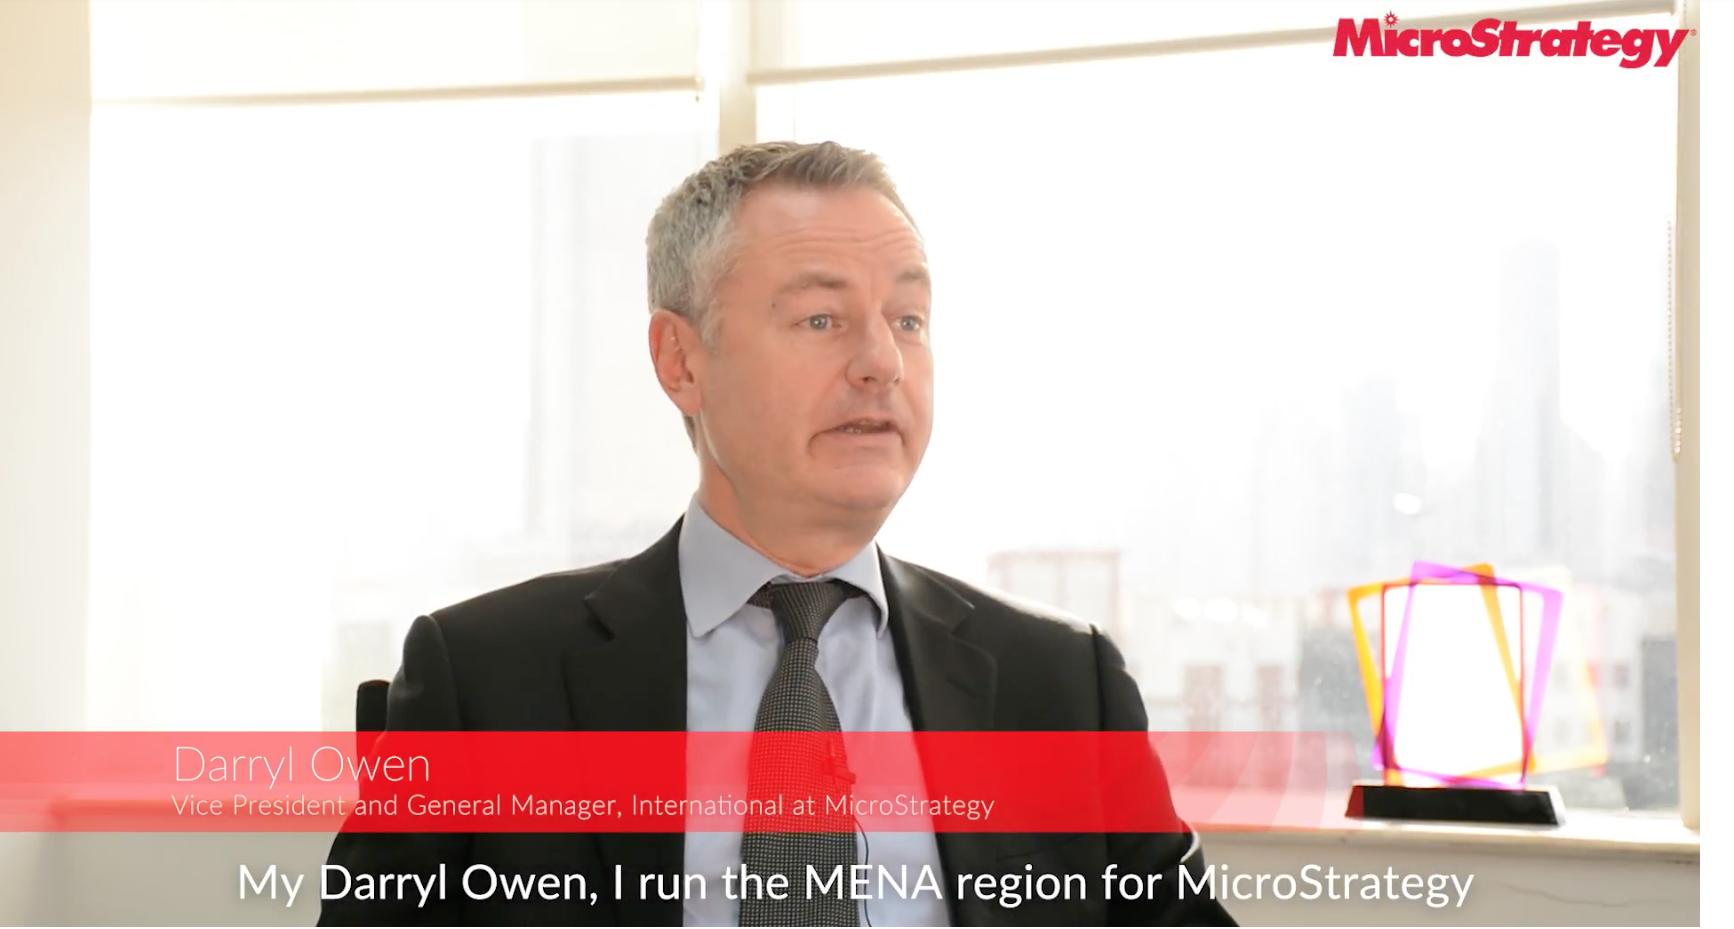 Darryl Owen video production microstrategy